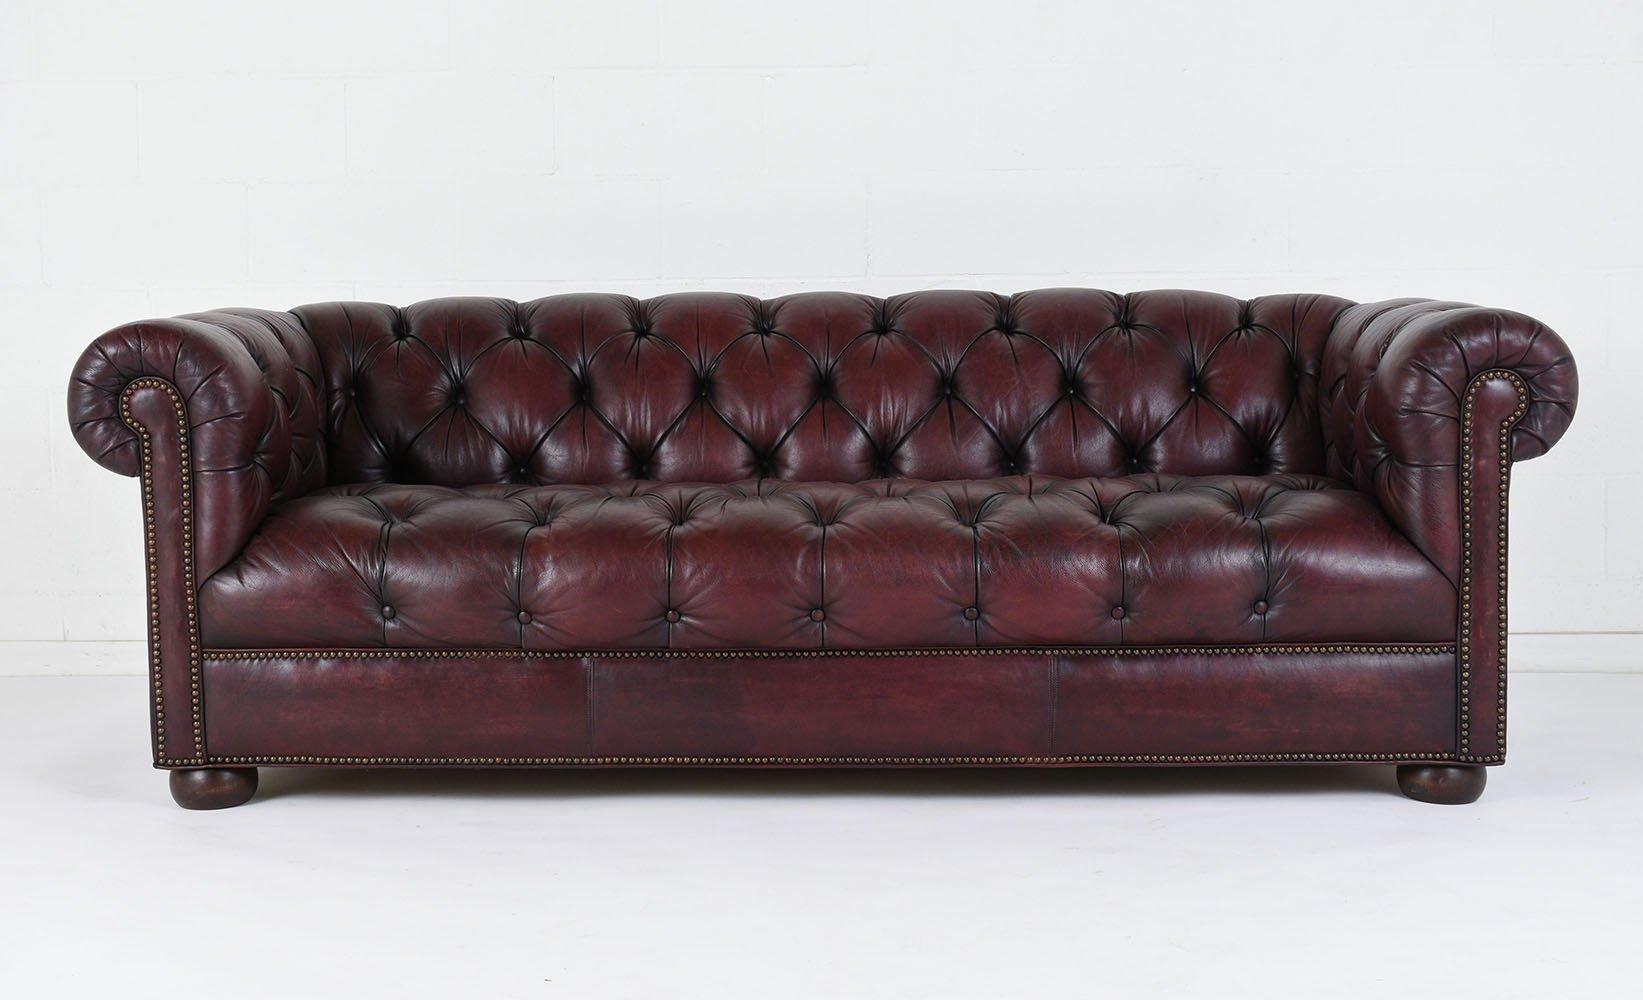 canap vintage capitonn en cuir 1970s en vente sur pamono. Black Bedroom Furniture Sets. Home Design Ideas